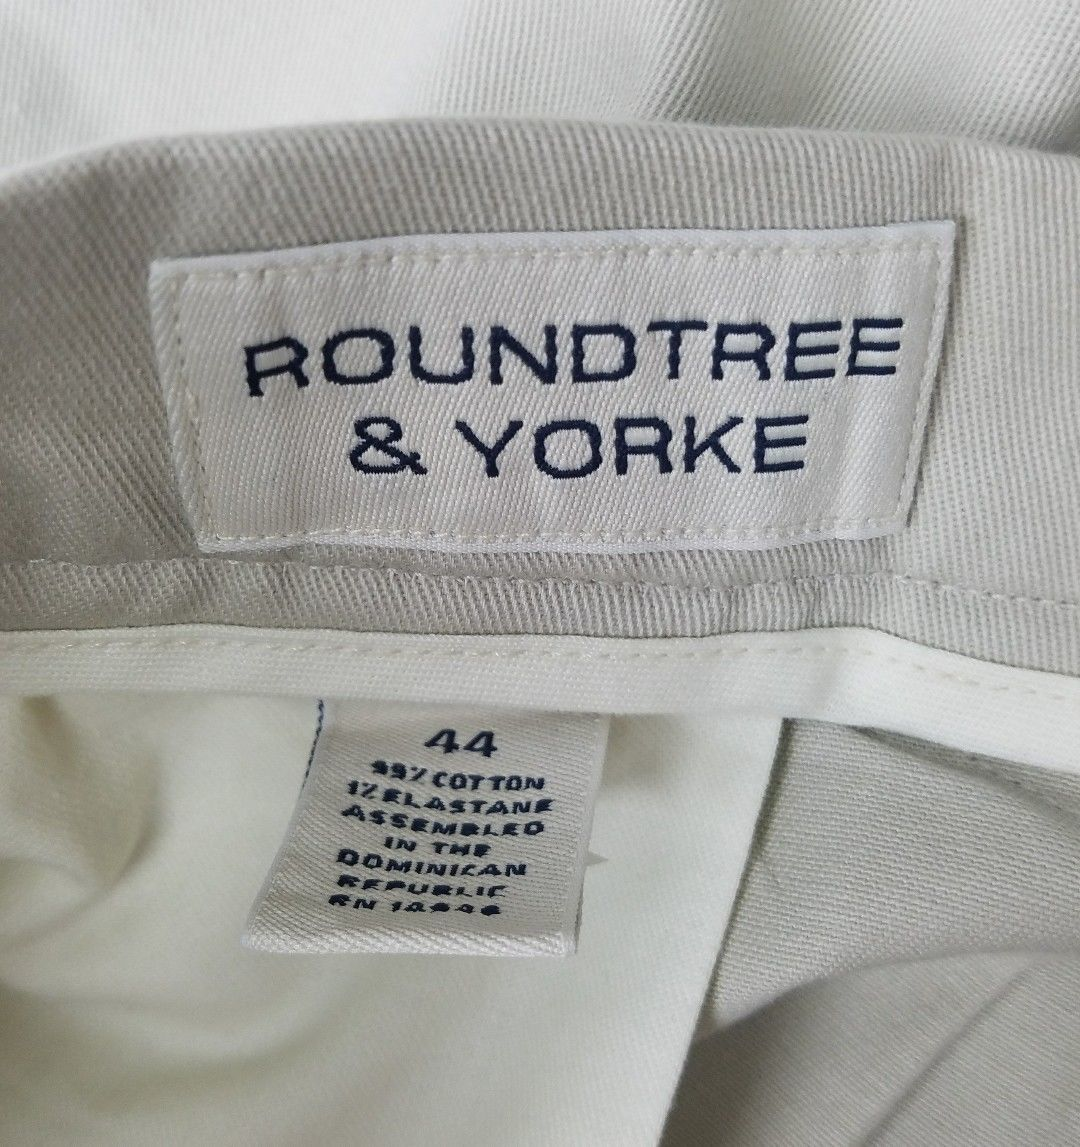 Roundtree & Yorke Mens Shorts Khaki Beige Relaxed Fit Size 44